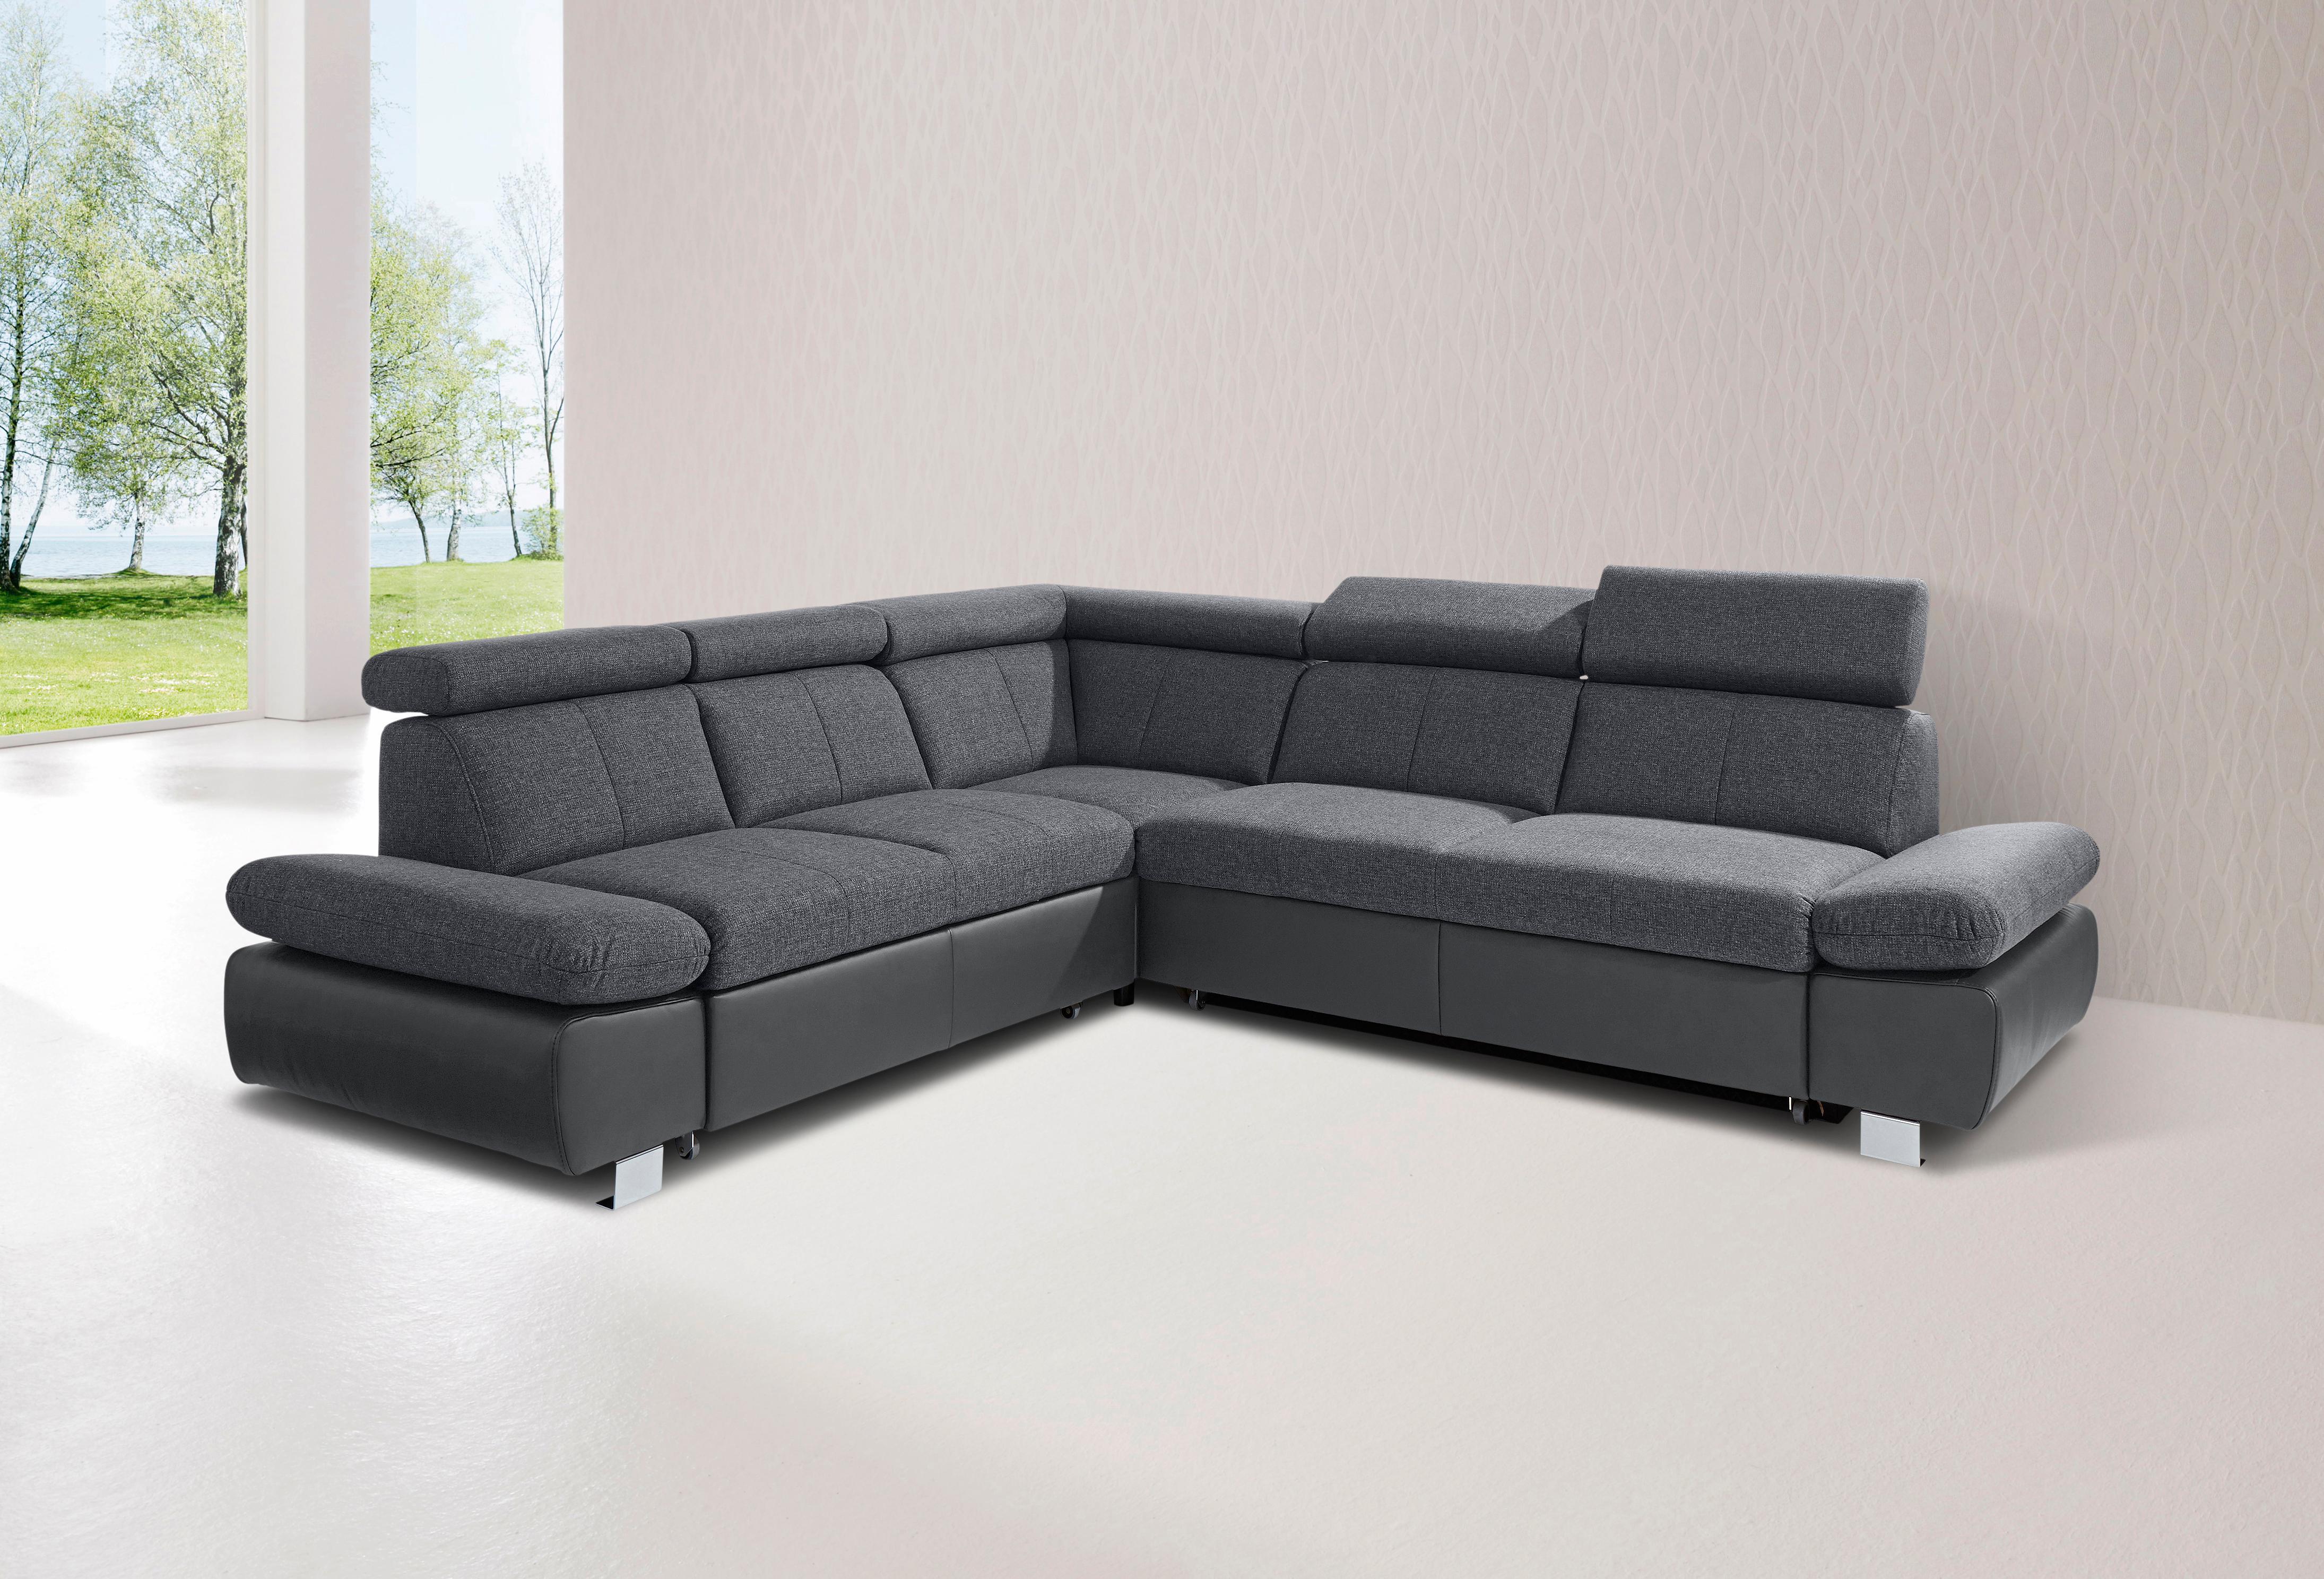 exxpo sofa fashion ecksofa auf rechnung bestellen baur. Black Bedroom Furniture Sets. Home Design Ideas